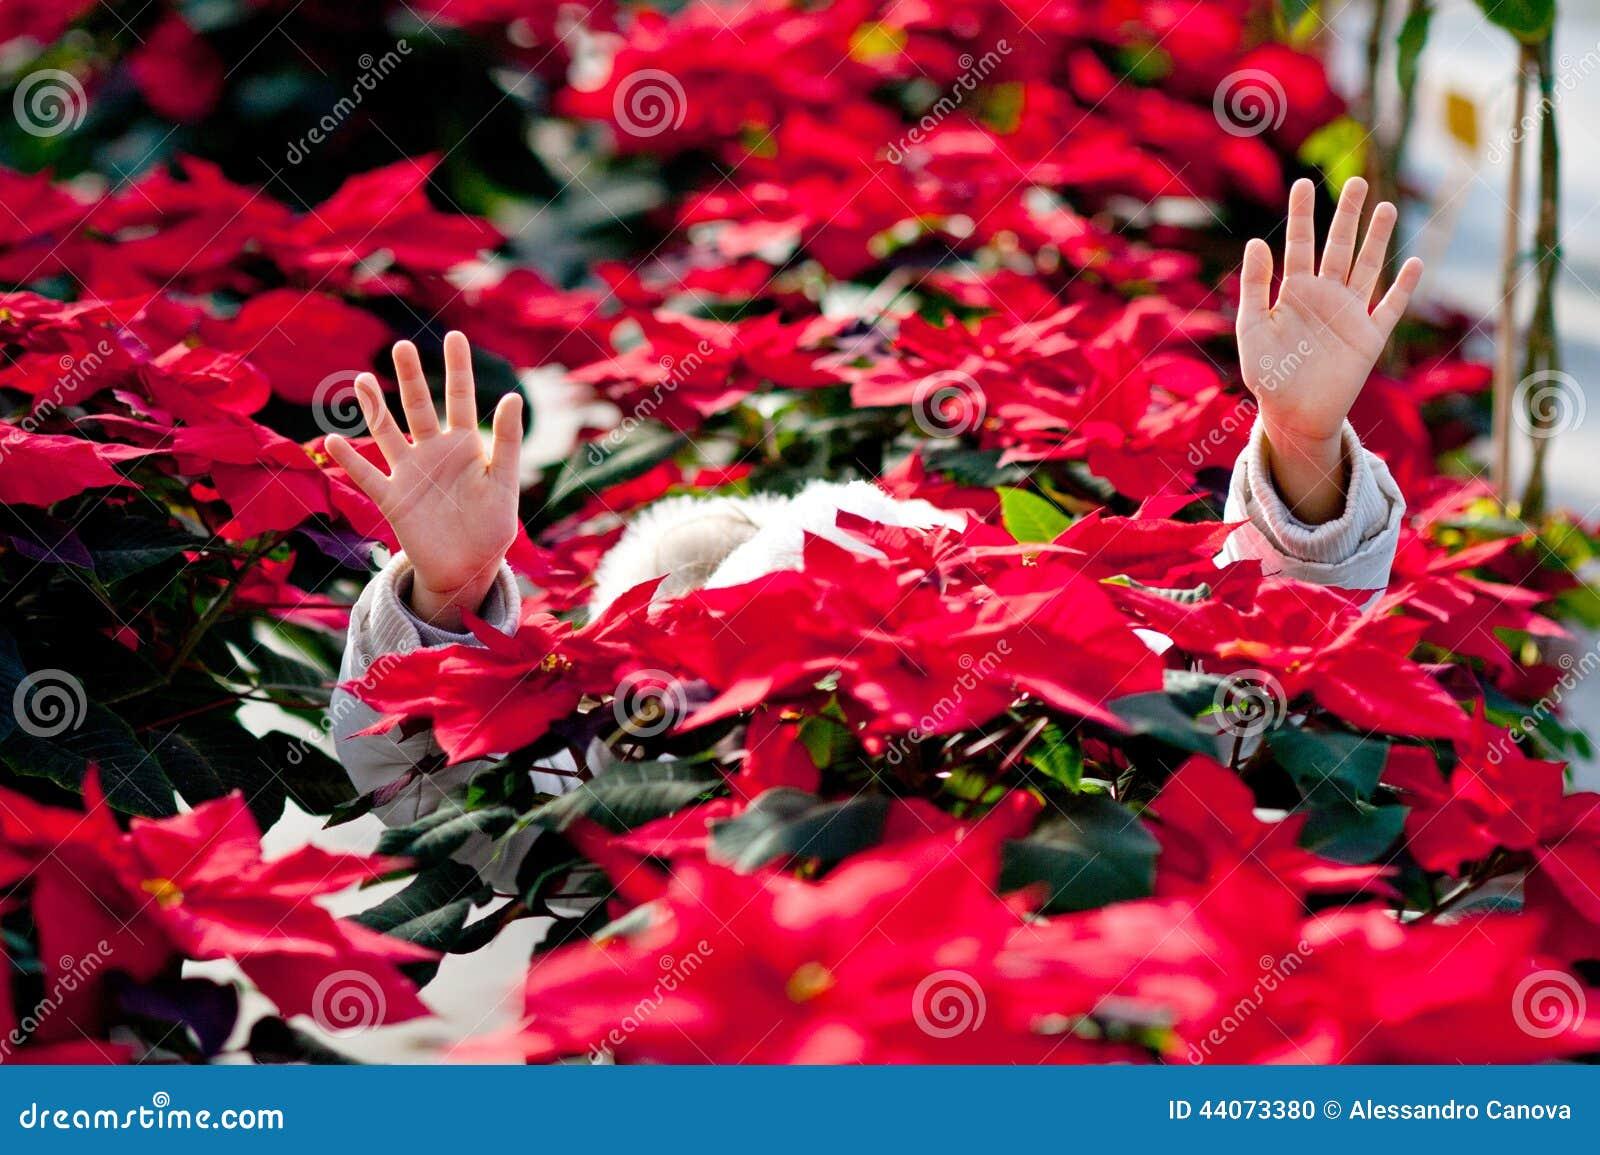 Child with poinsettias stock photo. Image of horizontal ...